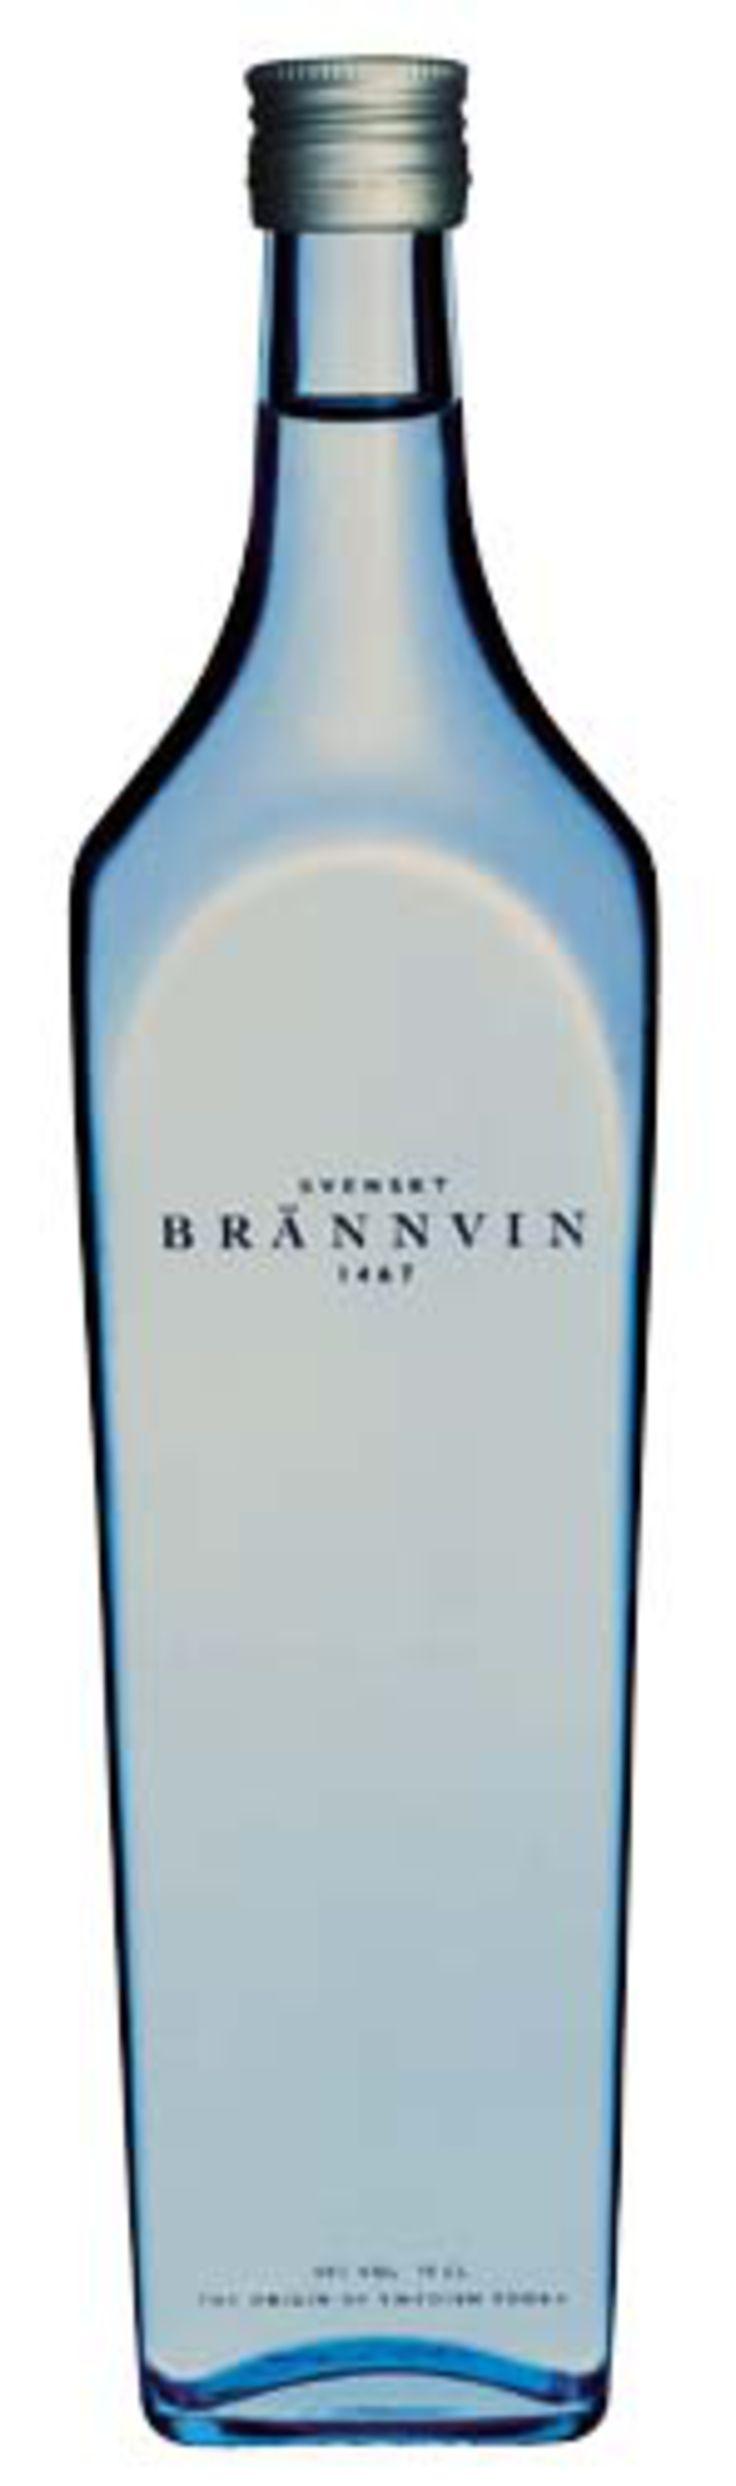 Read more: https://www.luerzersarchive.com/en/magazine/print-detail/4270.html Vodka Bottle. Tags: Cecilia Stroemgen,Gunnel Sahlin,Magnus Bruforss,Allied Domecq,Ogilvy & Mather, Stockholm